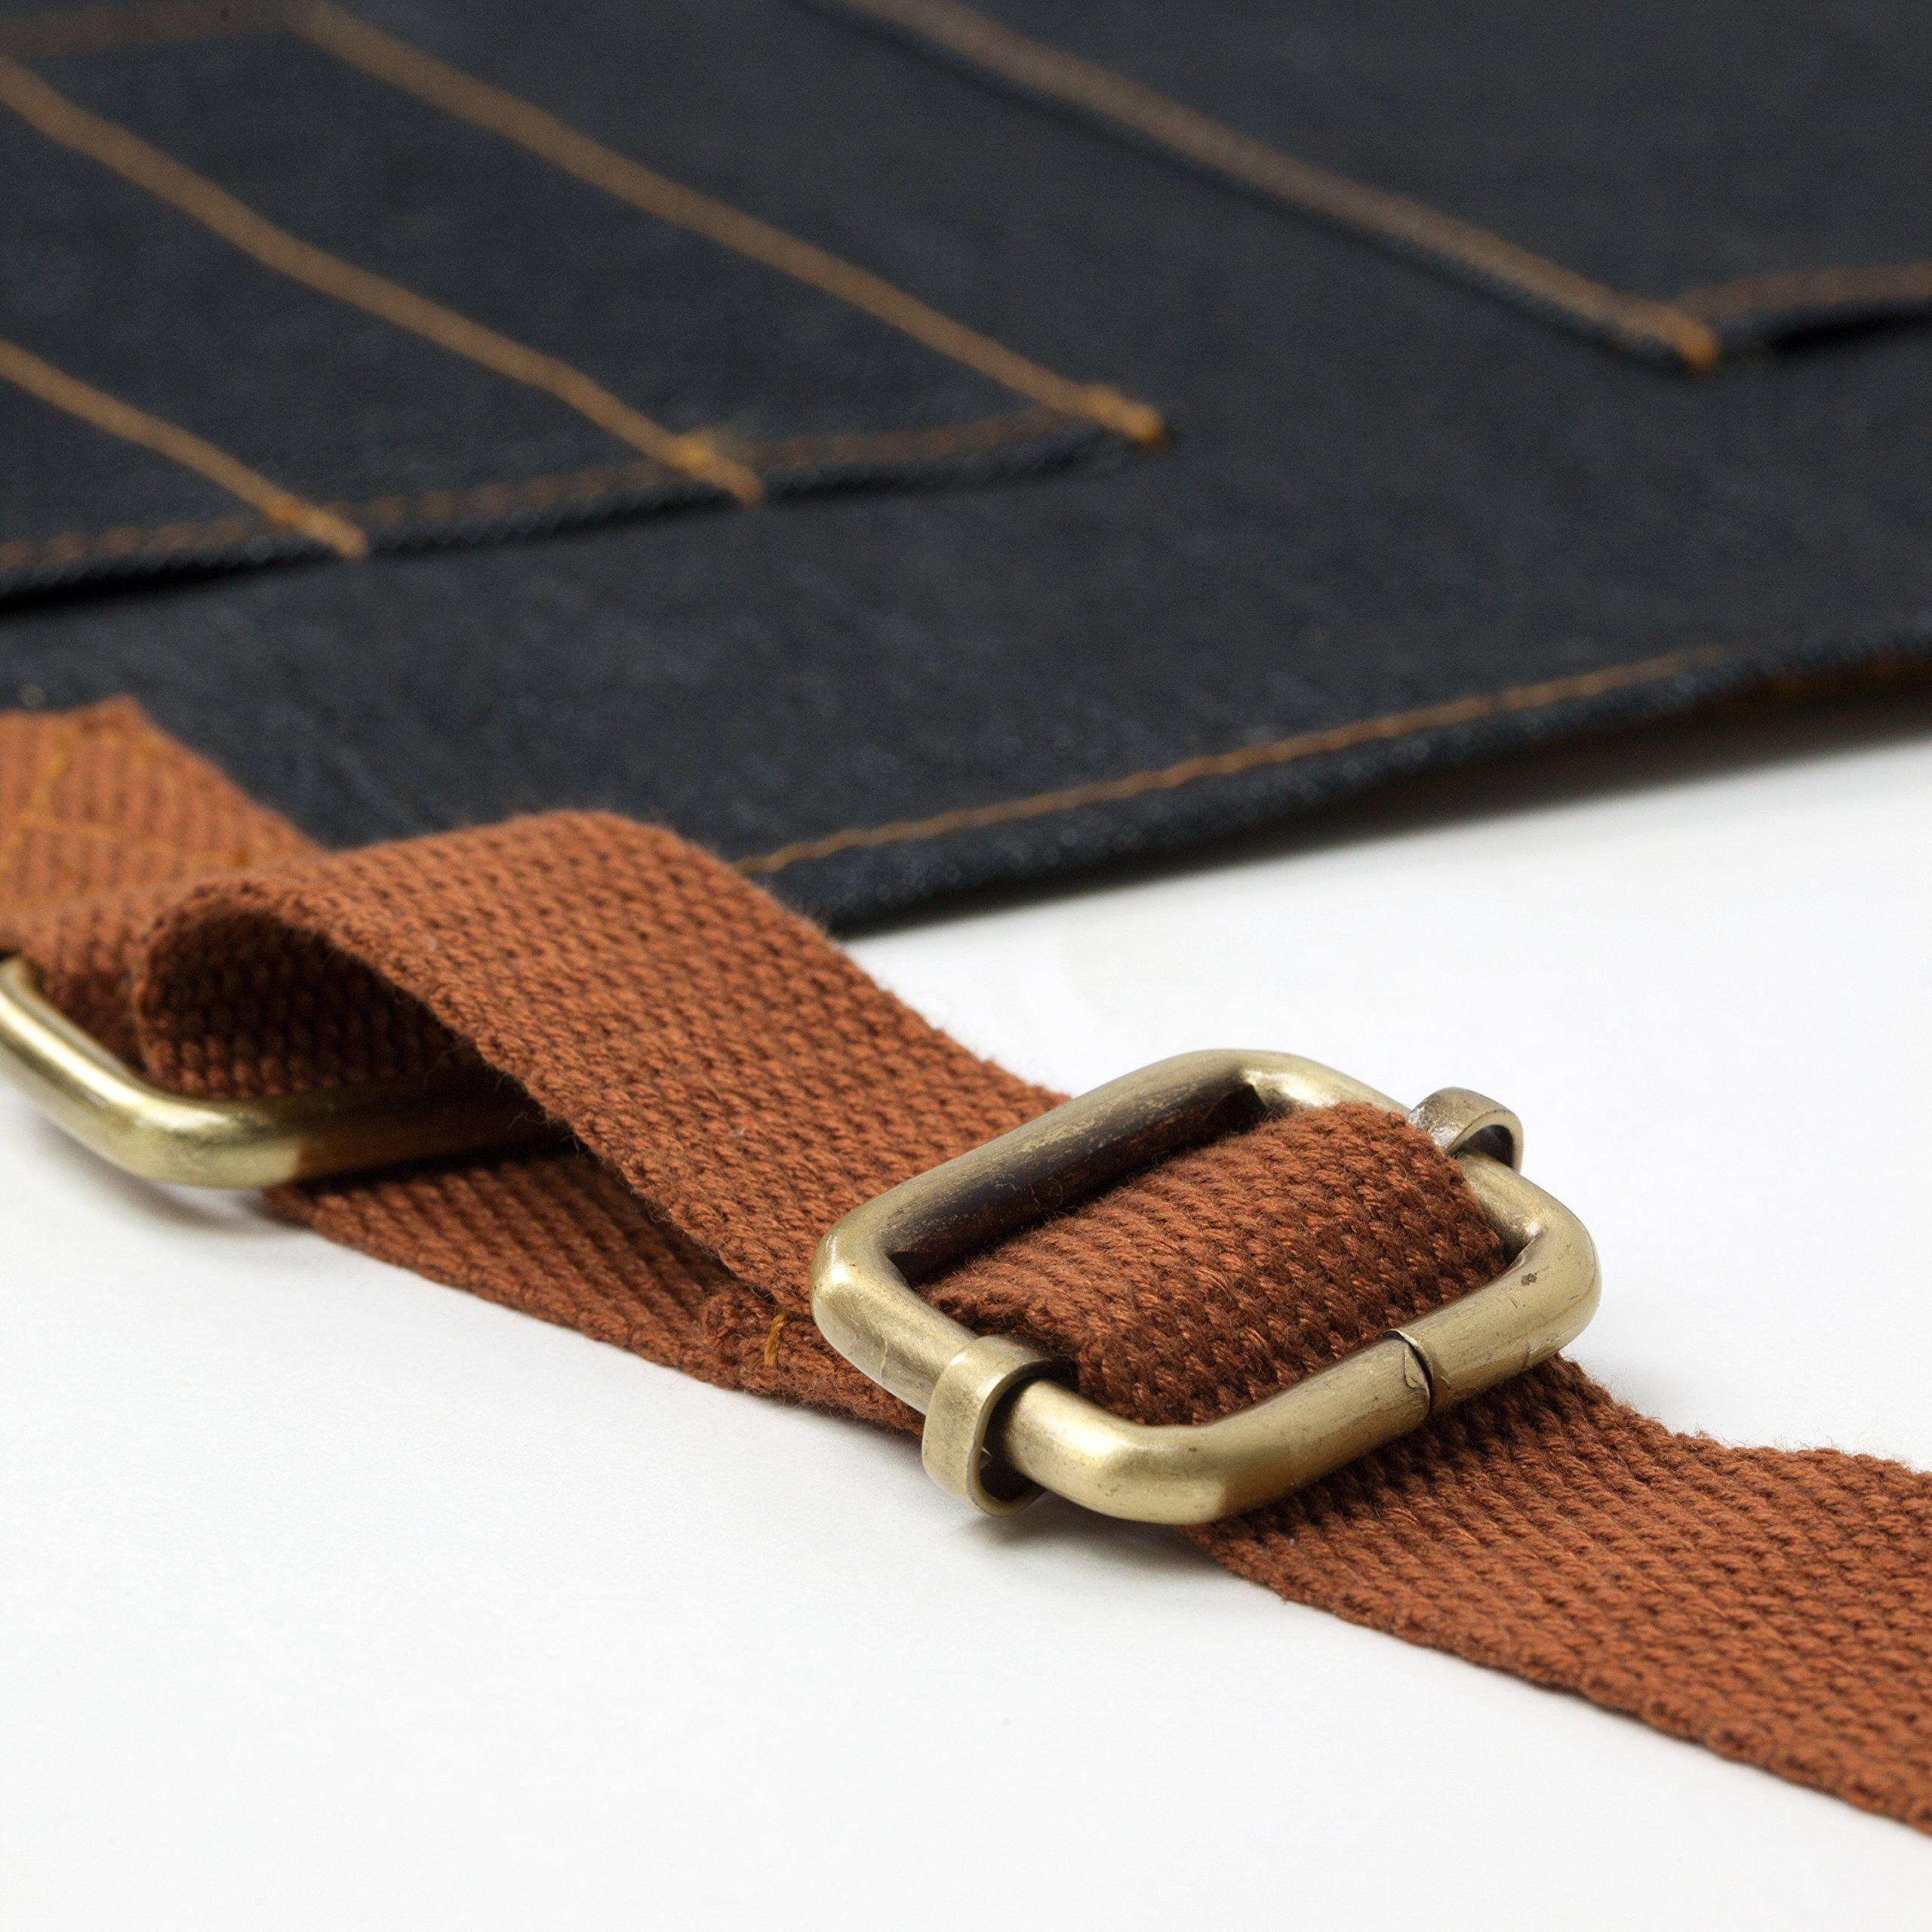 Vulcan Workwear Utility Apron - Multi-Use Shop Apron with Pockets - Lightweight Denim Tool Apron by Vulcan Workwear (Image #4)